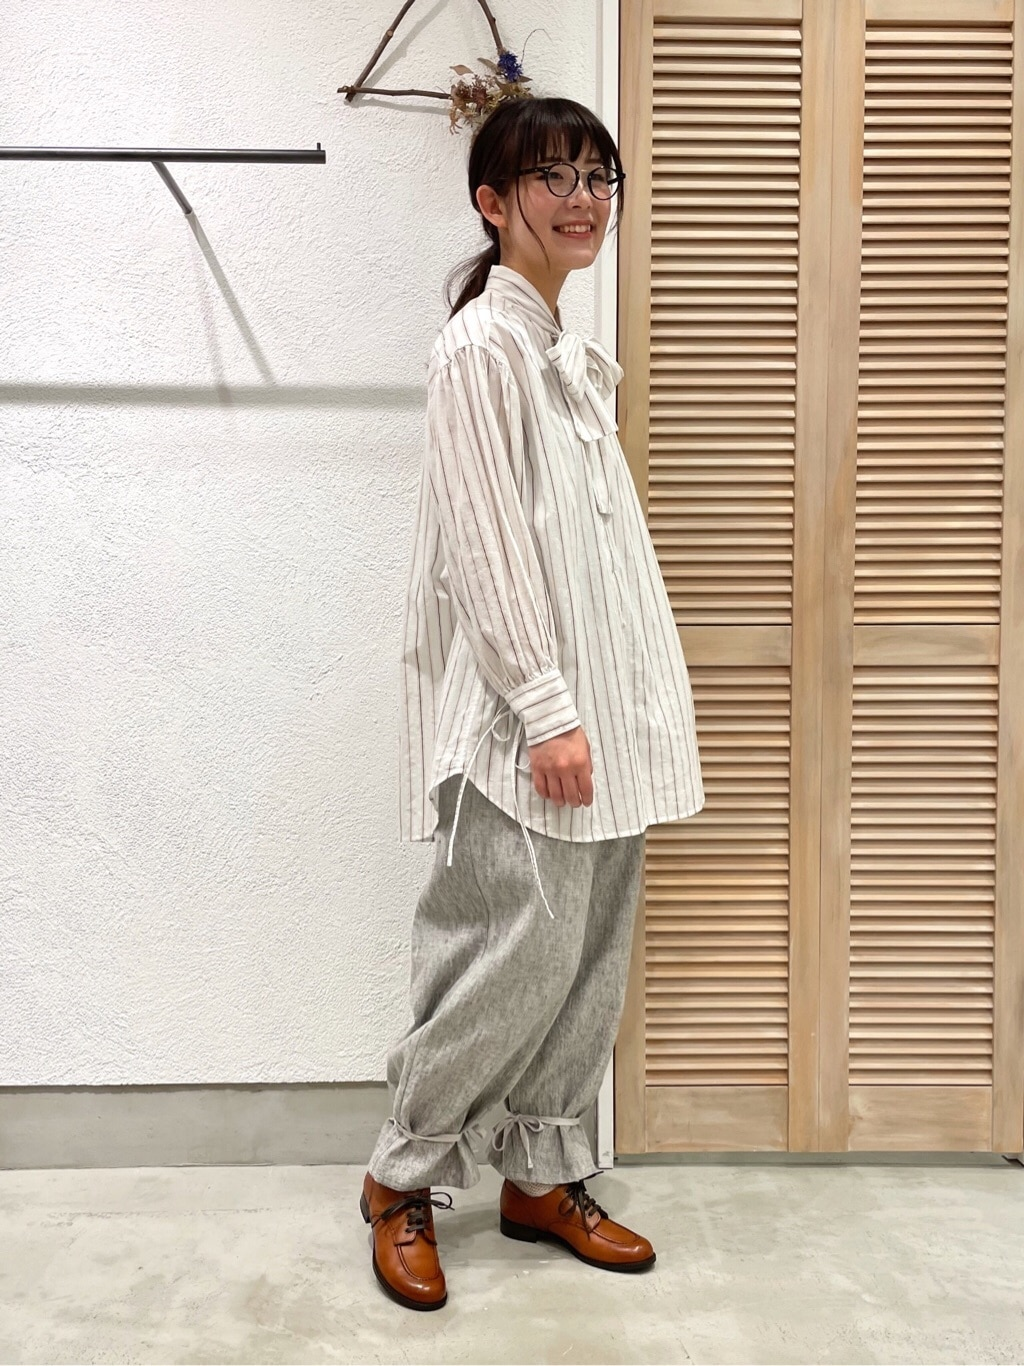 chambre de charme 横浜ジョイナス 身長:162cm 2021.03.04